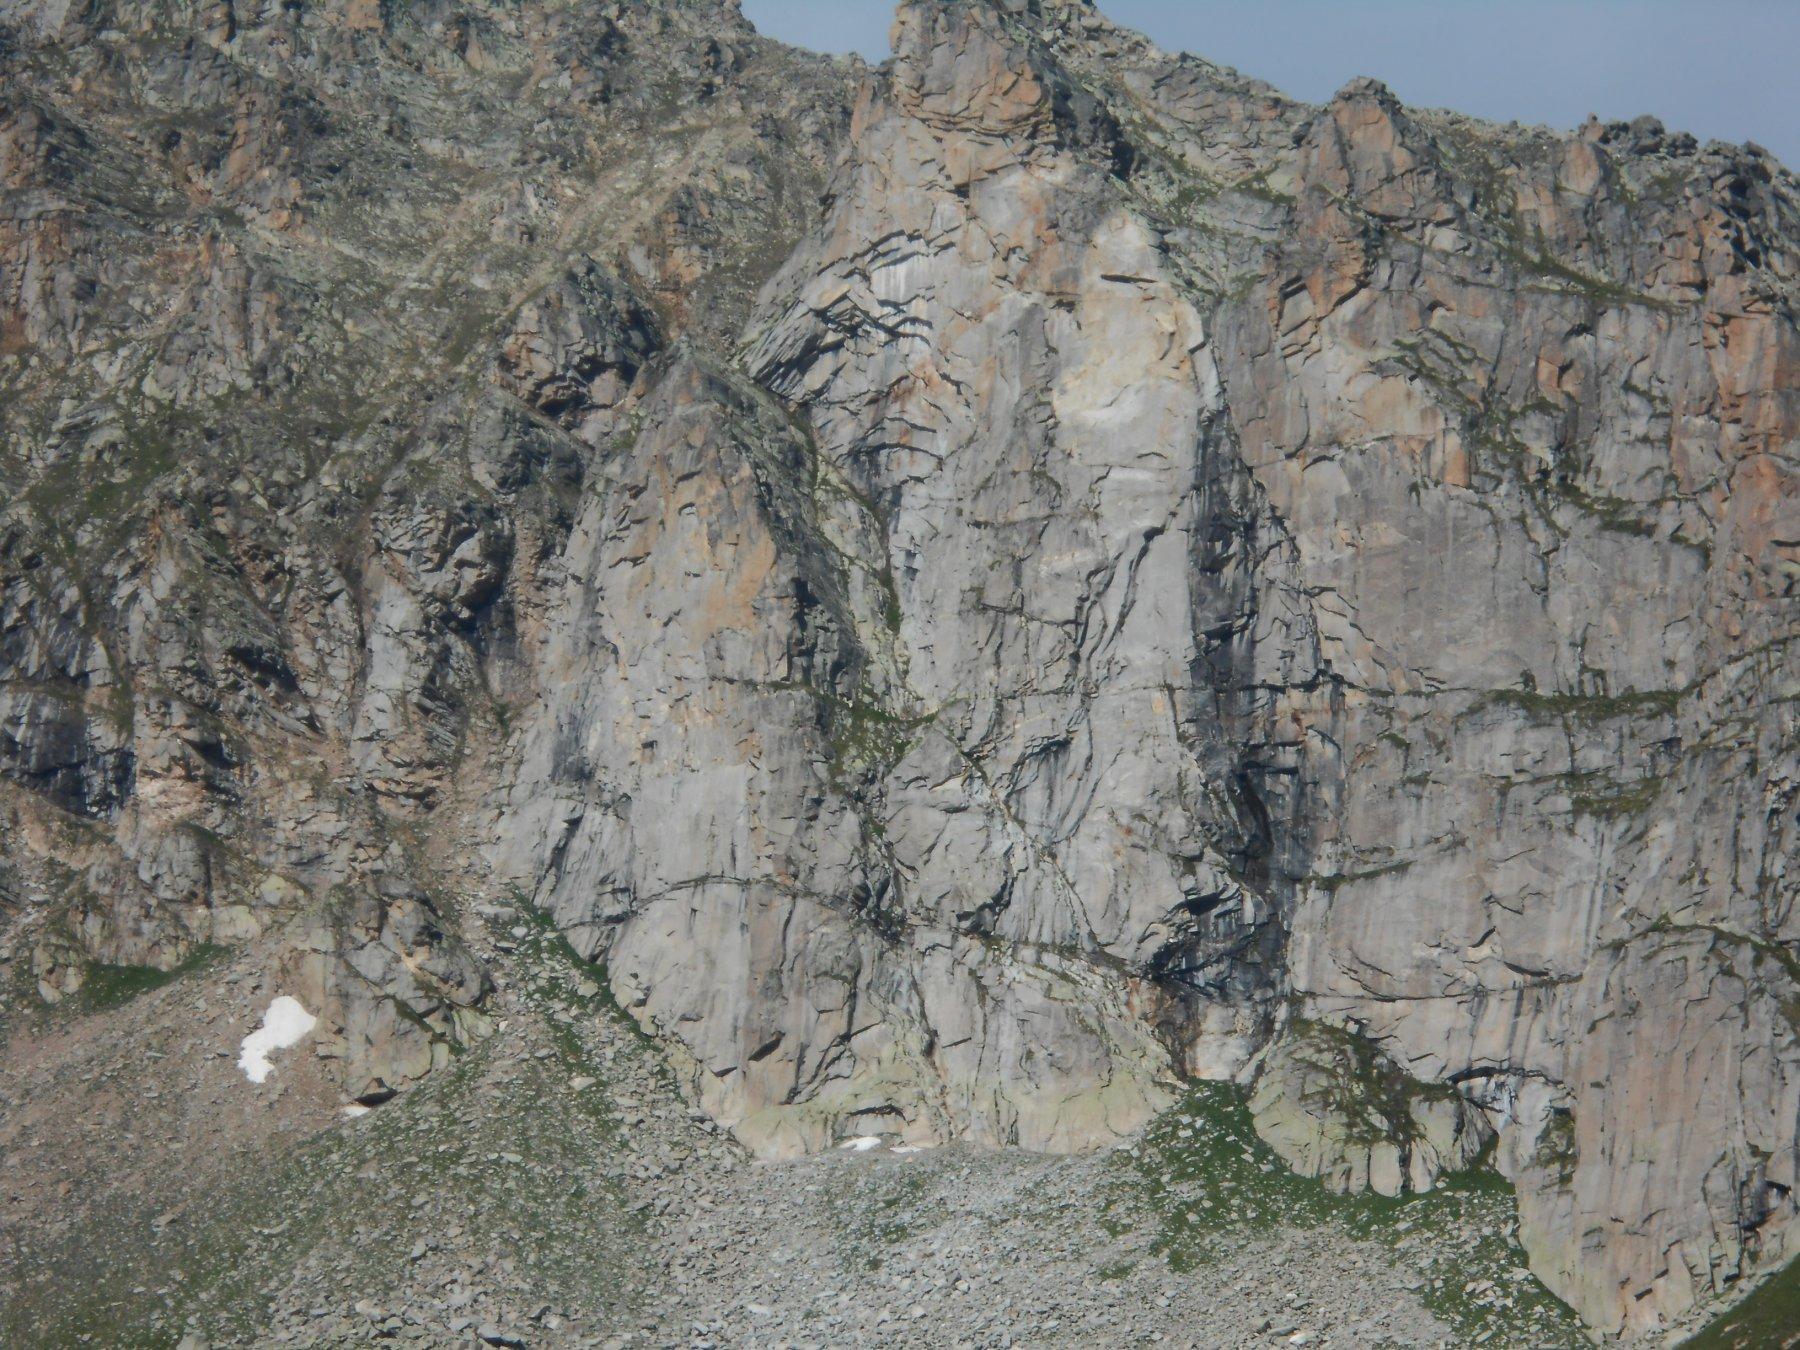 La parete vista dall'alpe Broglia